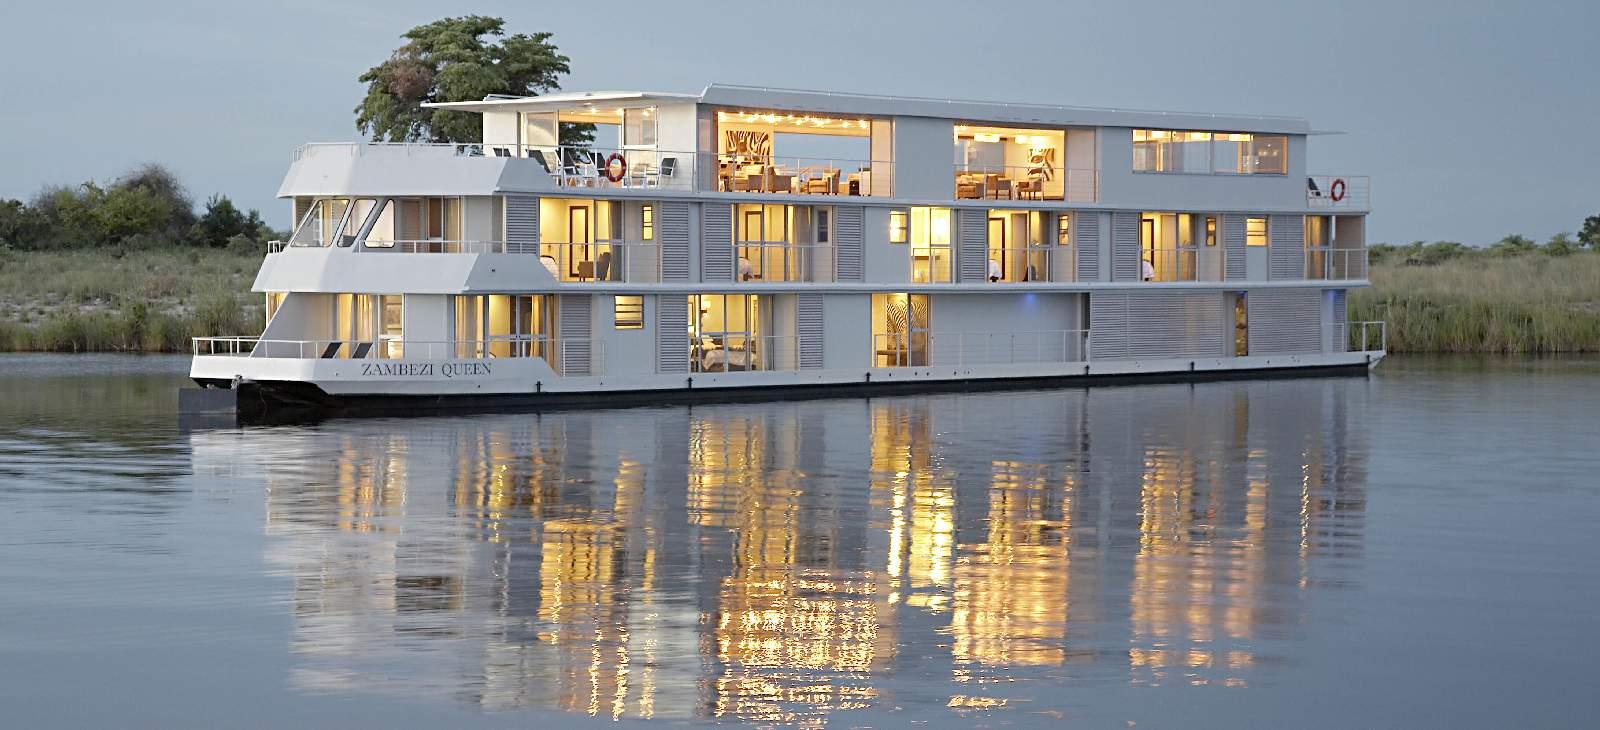 Zambezi Queen - Crucero por el río Chobe